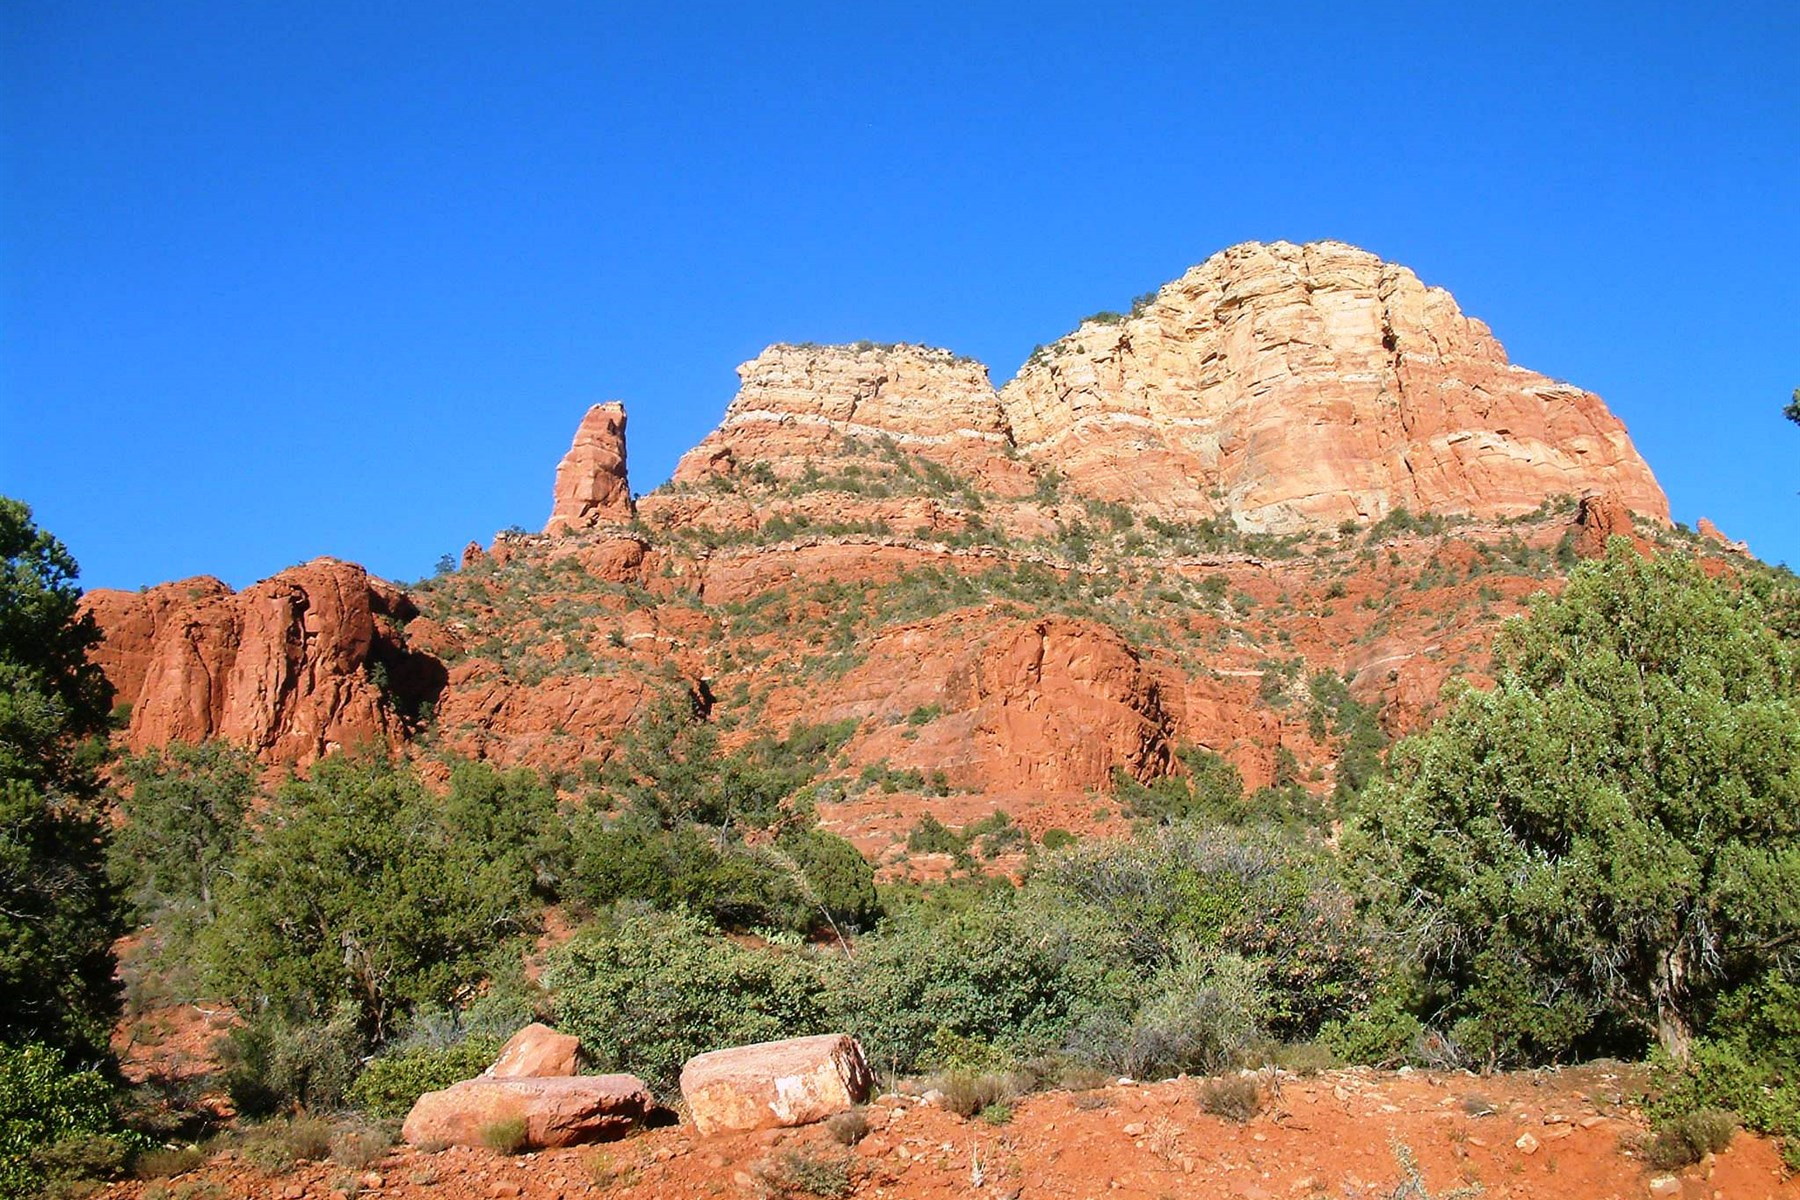 Terreno per Vendita alle ore Lovely lot in the highest elevations in prestigious Mystic Hills 411 Acacia Dr #16, Sedona, Arizona, 86336 Stati Uniti